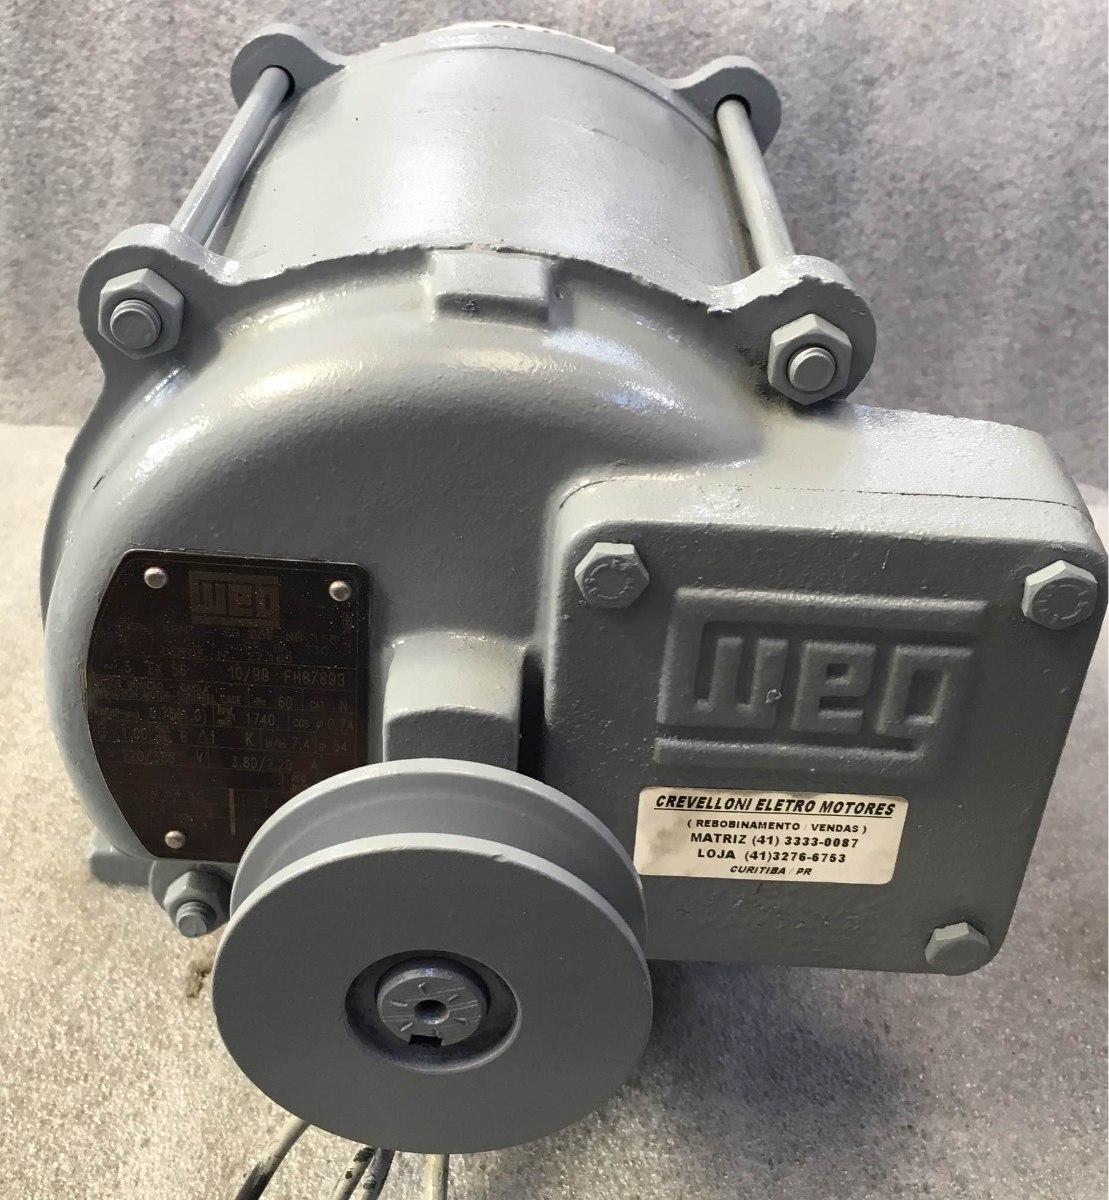 42e2943b34f Motor Elétrico Weg 1cv 4p Trifásico(p bomba Comb.)220 380v - R  320 ...